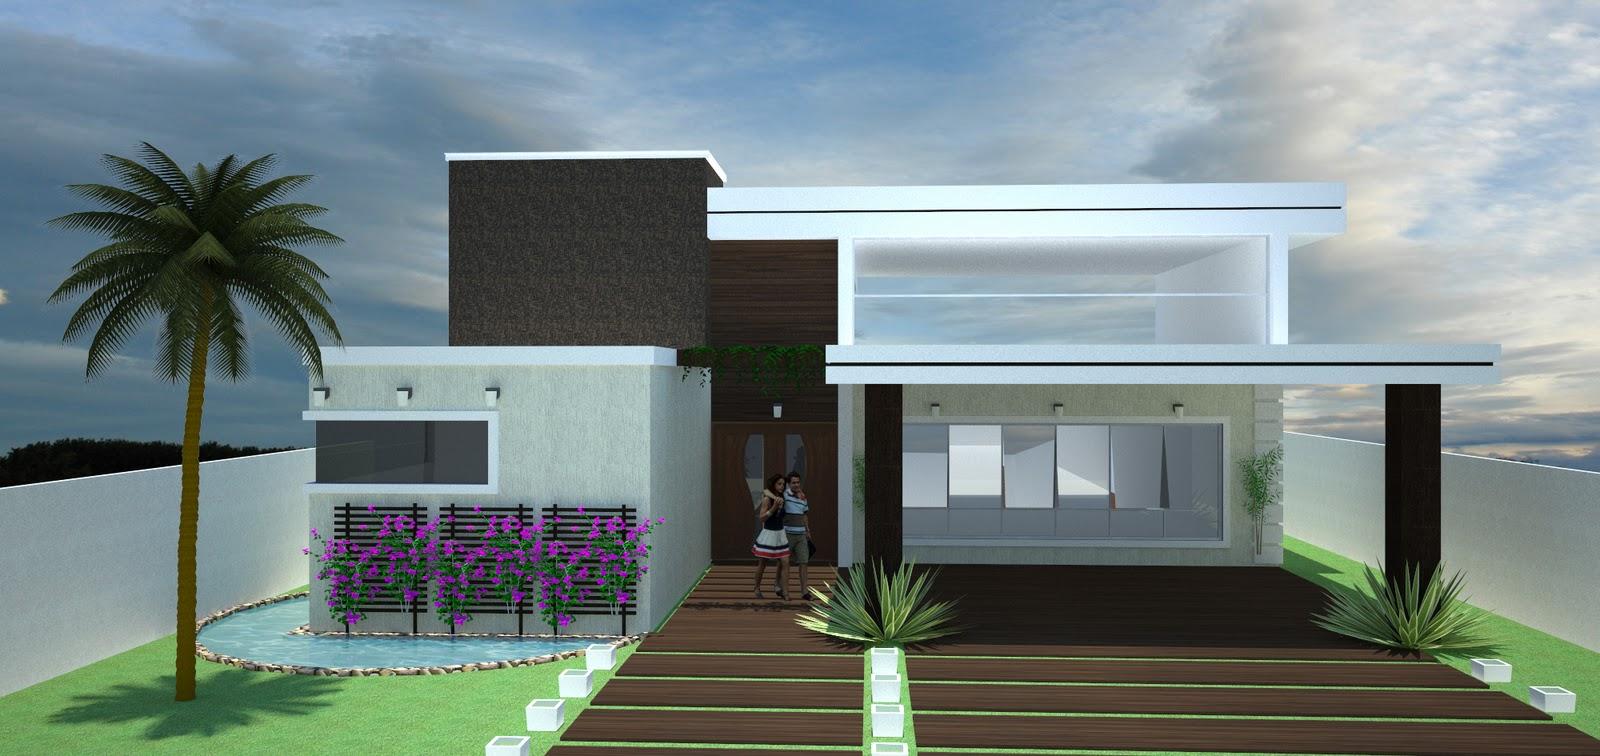 frente-de-casas-modernas-e-bonitas